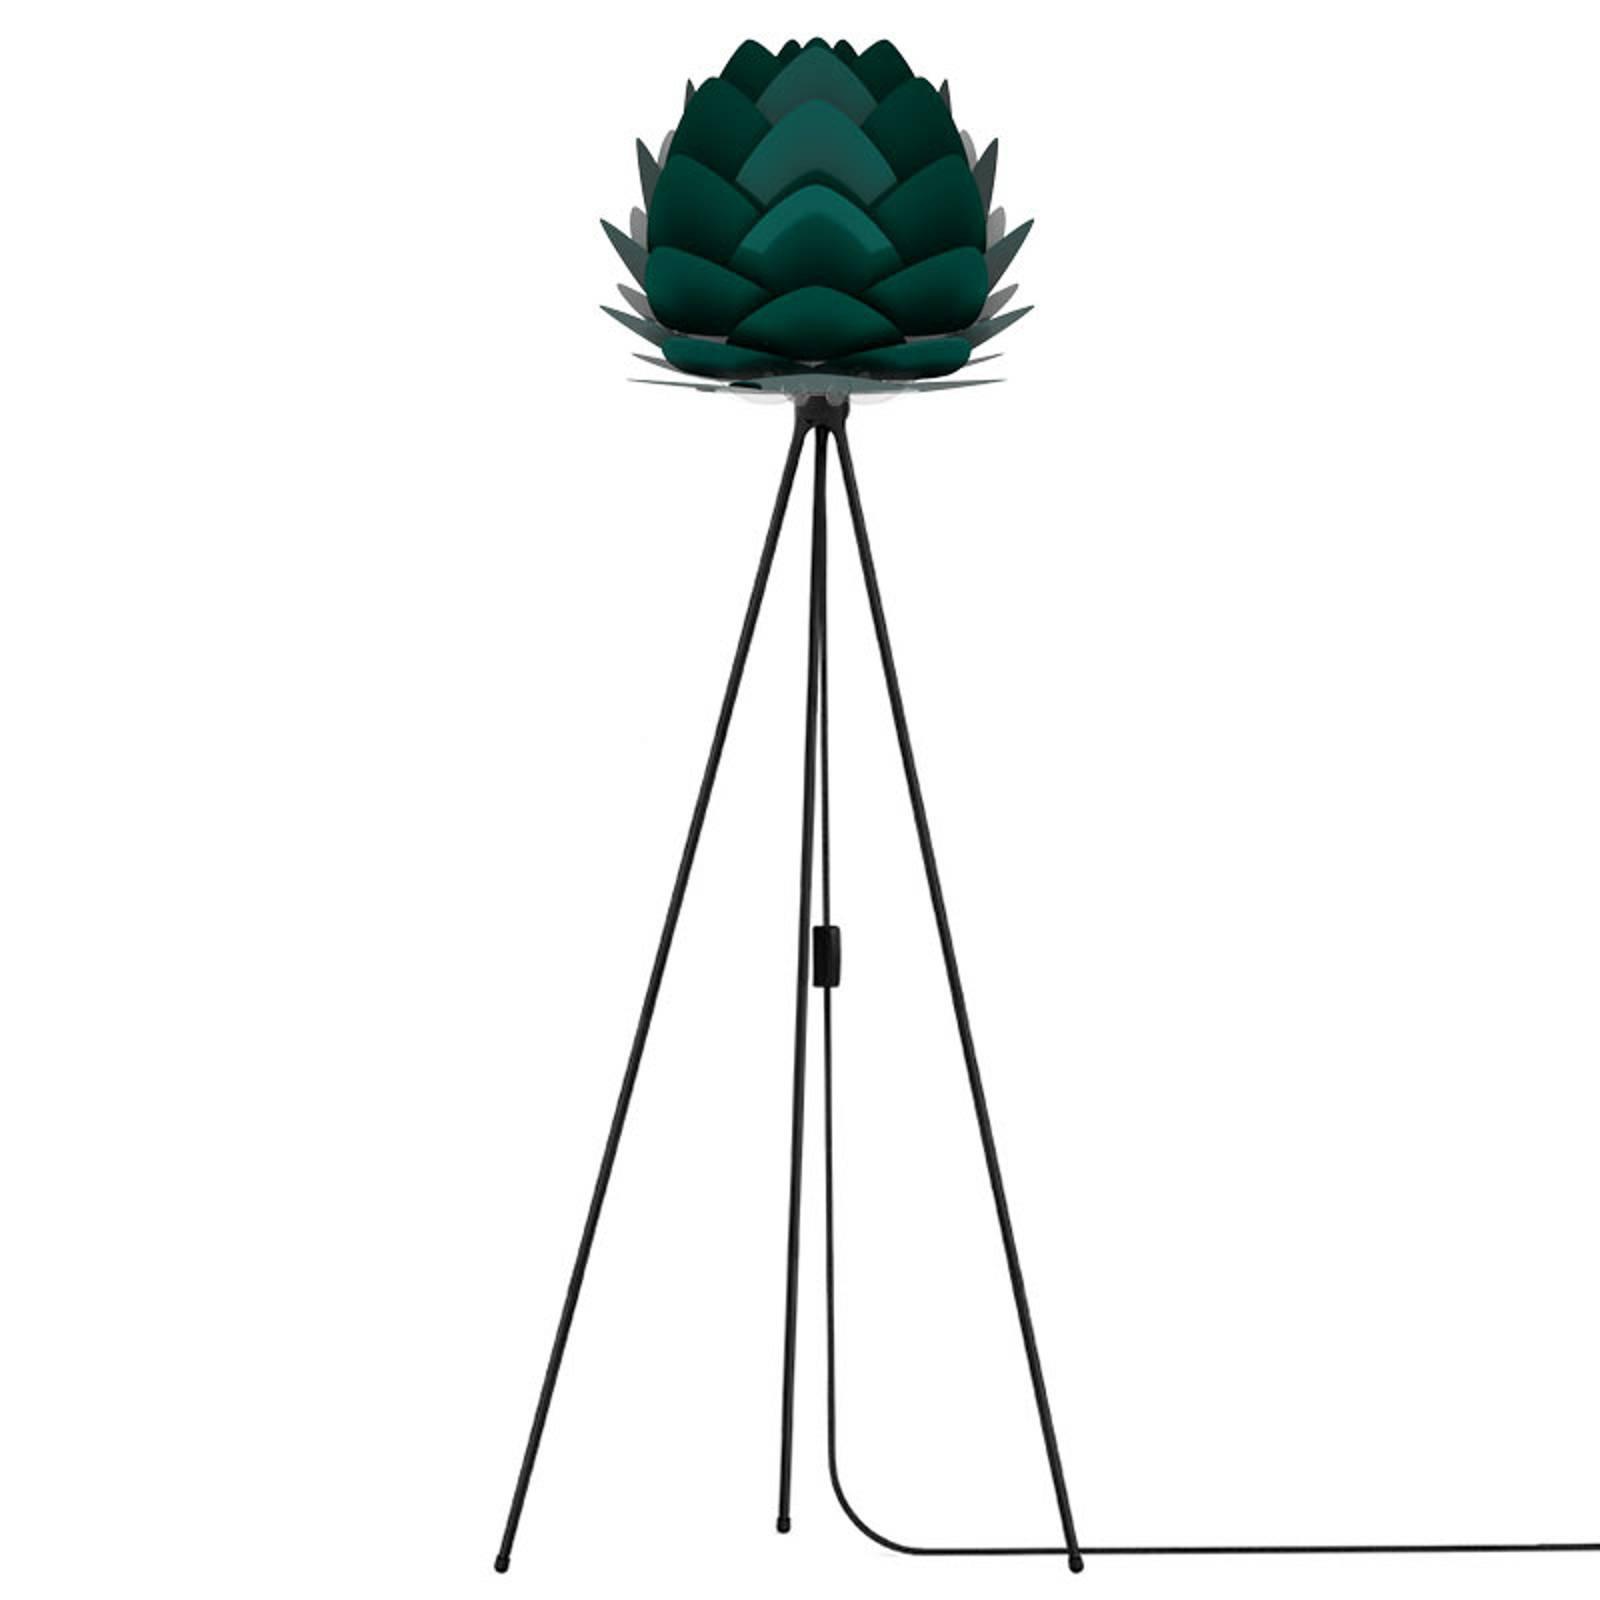 UMAGE Aluvia mini-gulvlampe svart/grønn